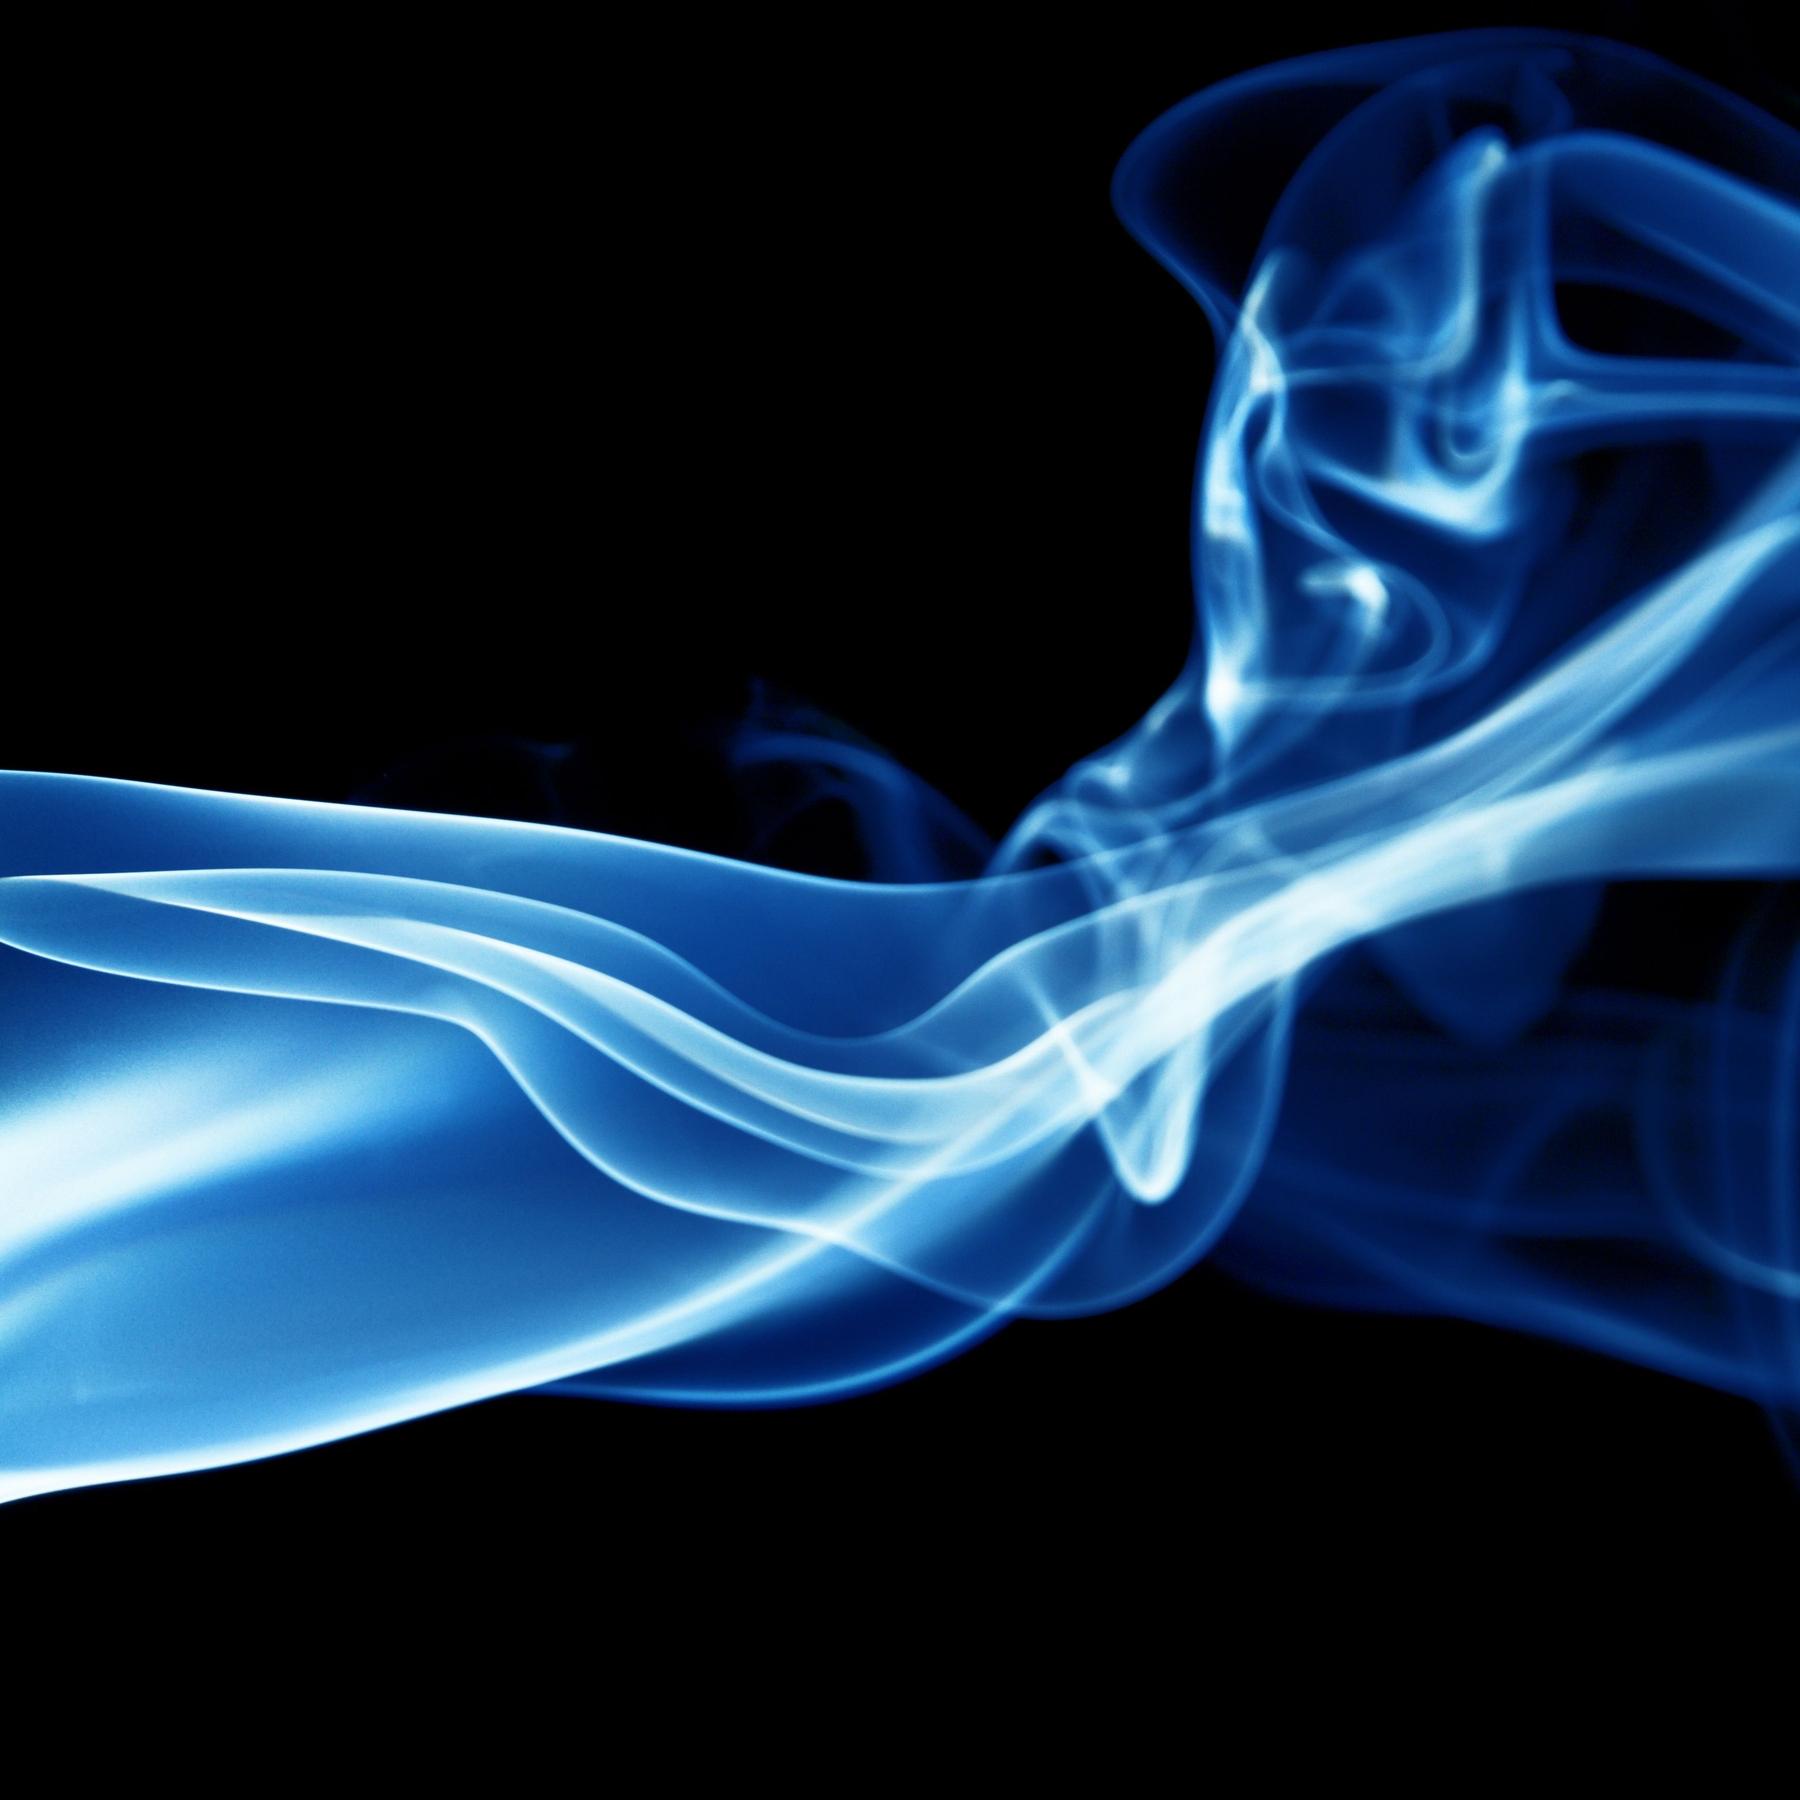 Blue smoke Wall mural | Photo wallpaper | Blue | Neon - Happywall